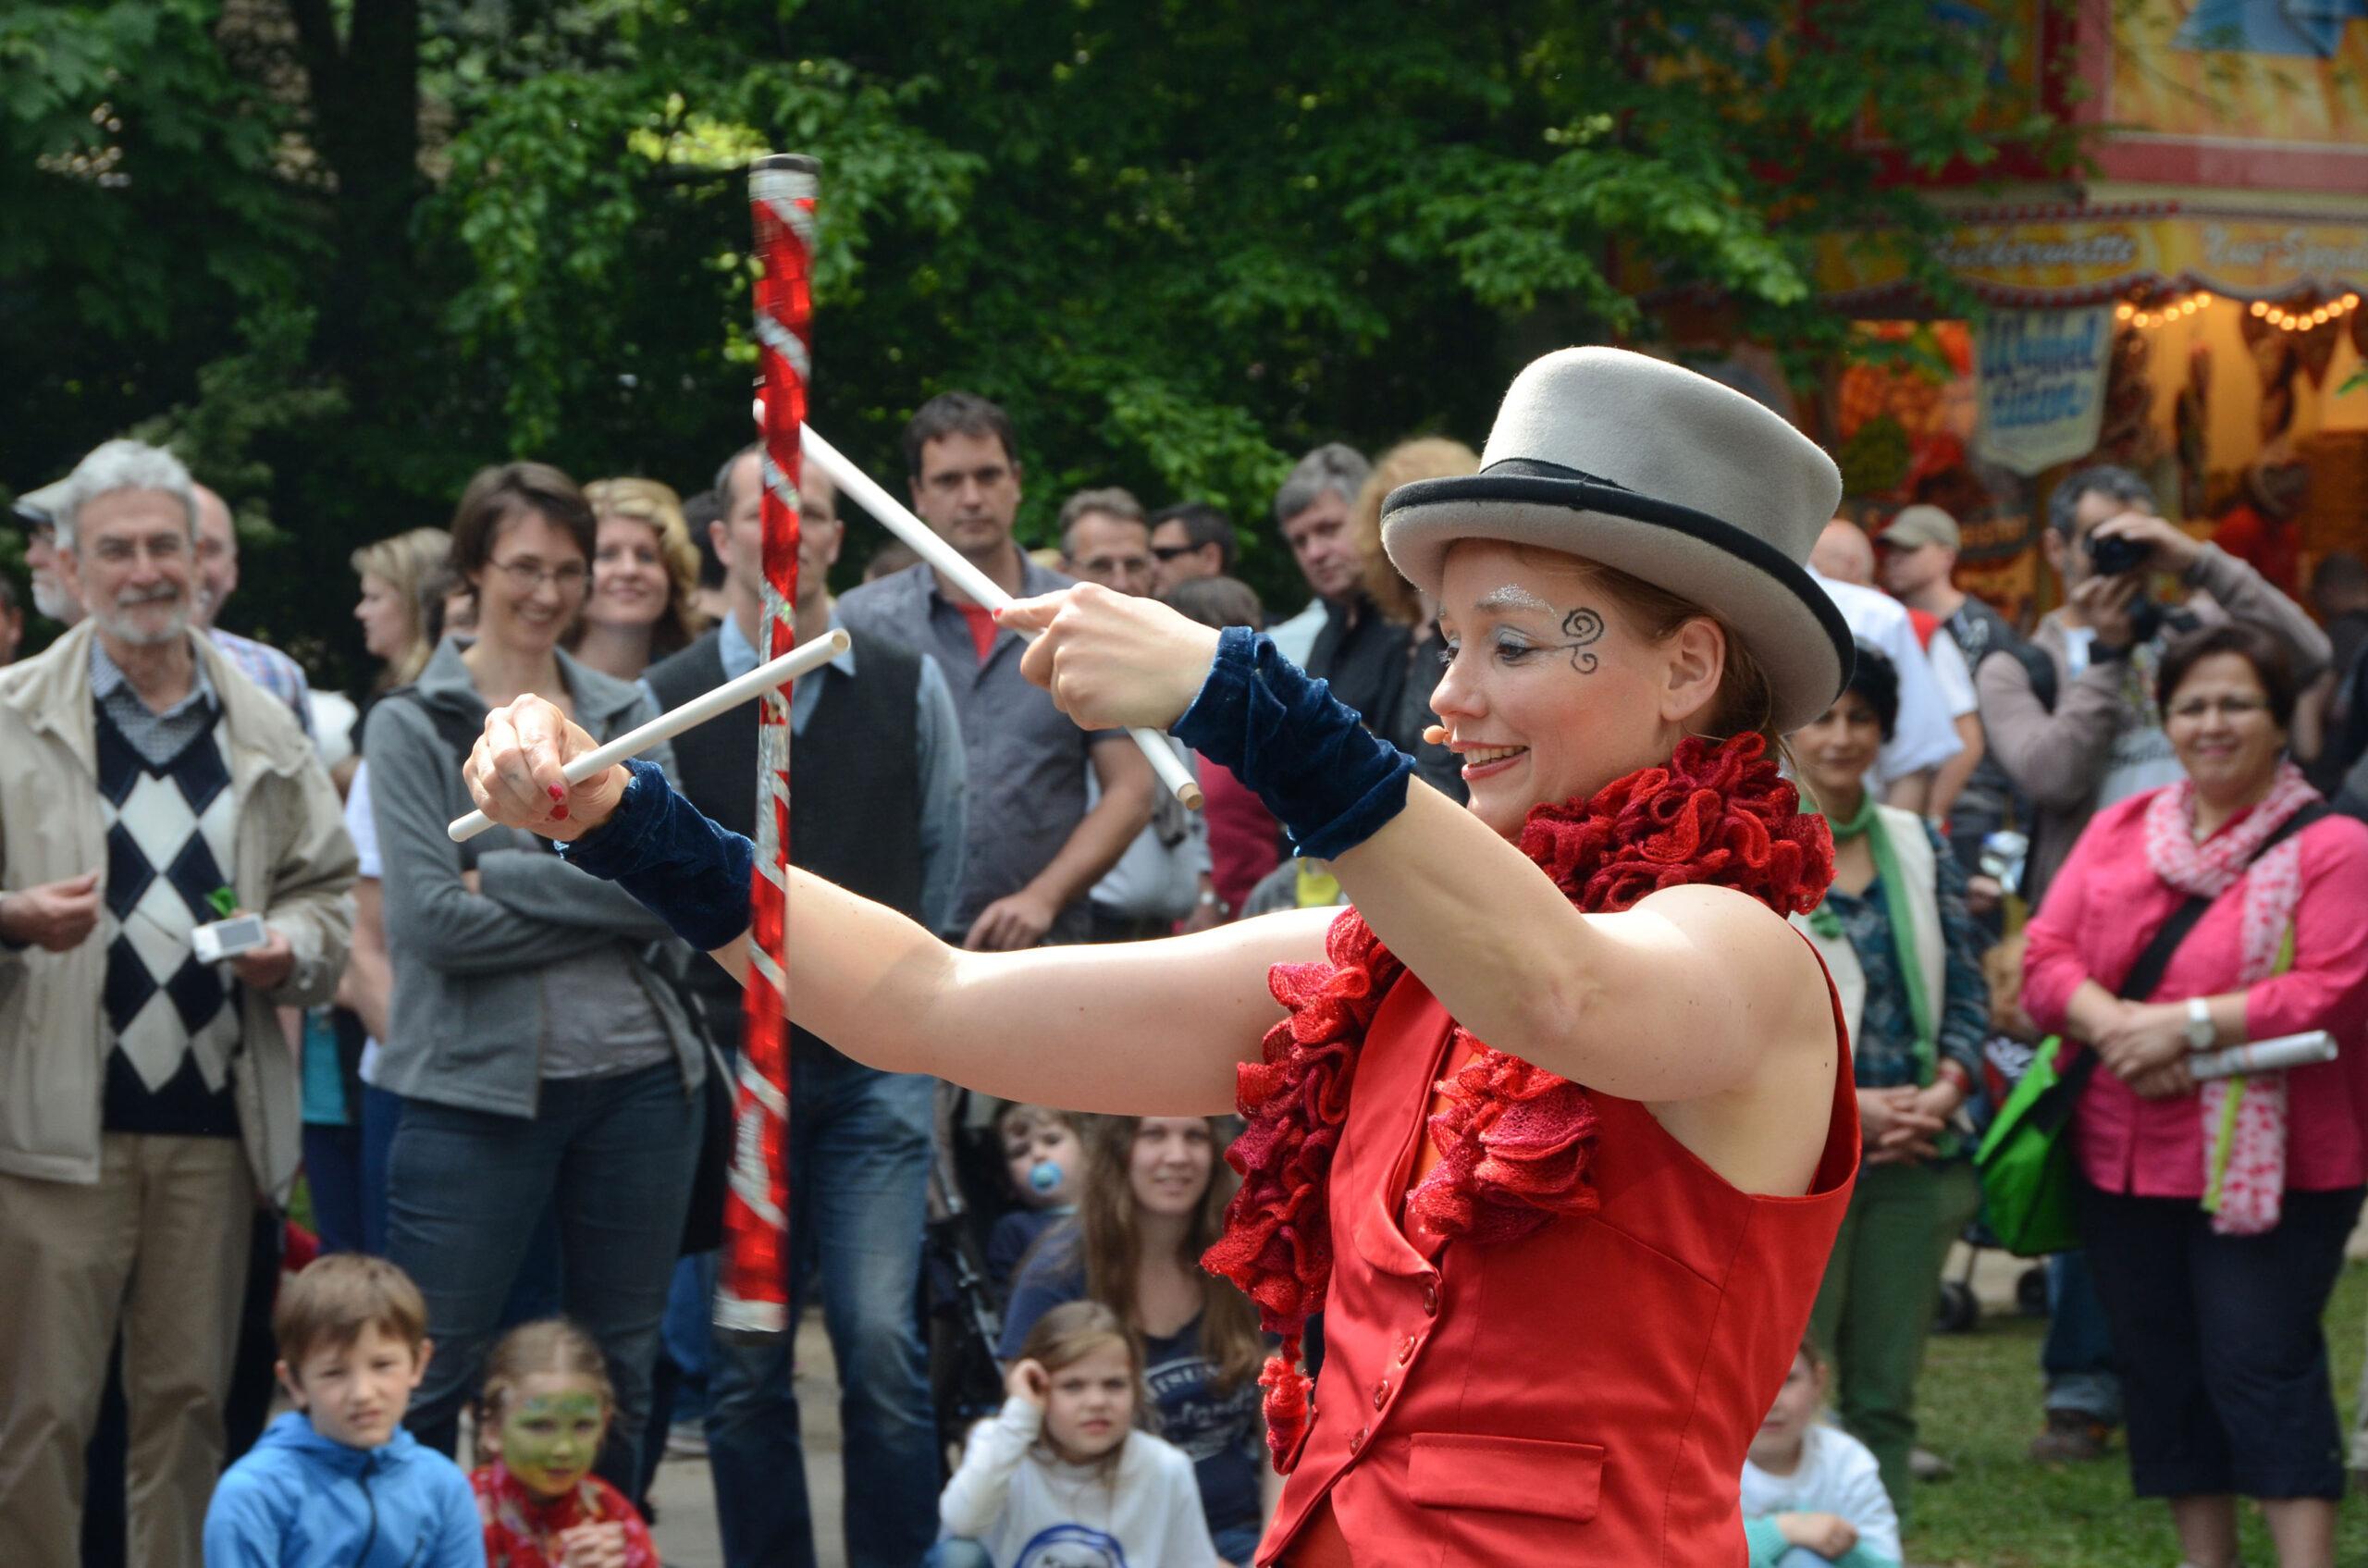 Märchen, Kindertheater, Familien, Puppentheater, Erzählung, Stuttgart